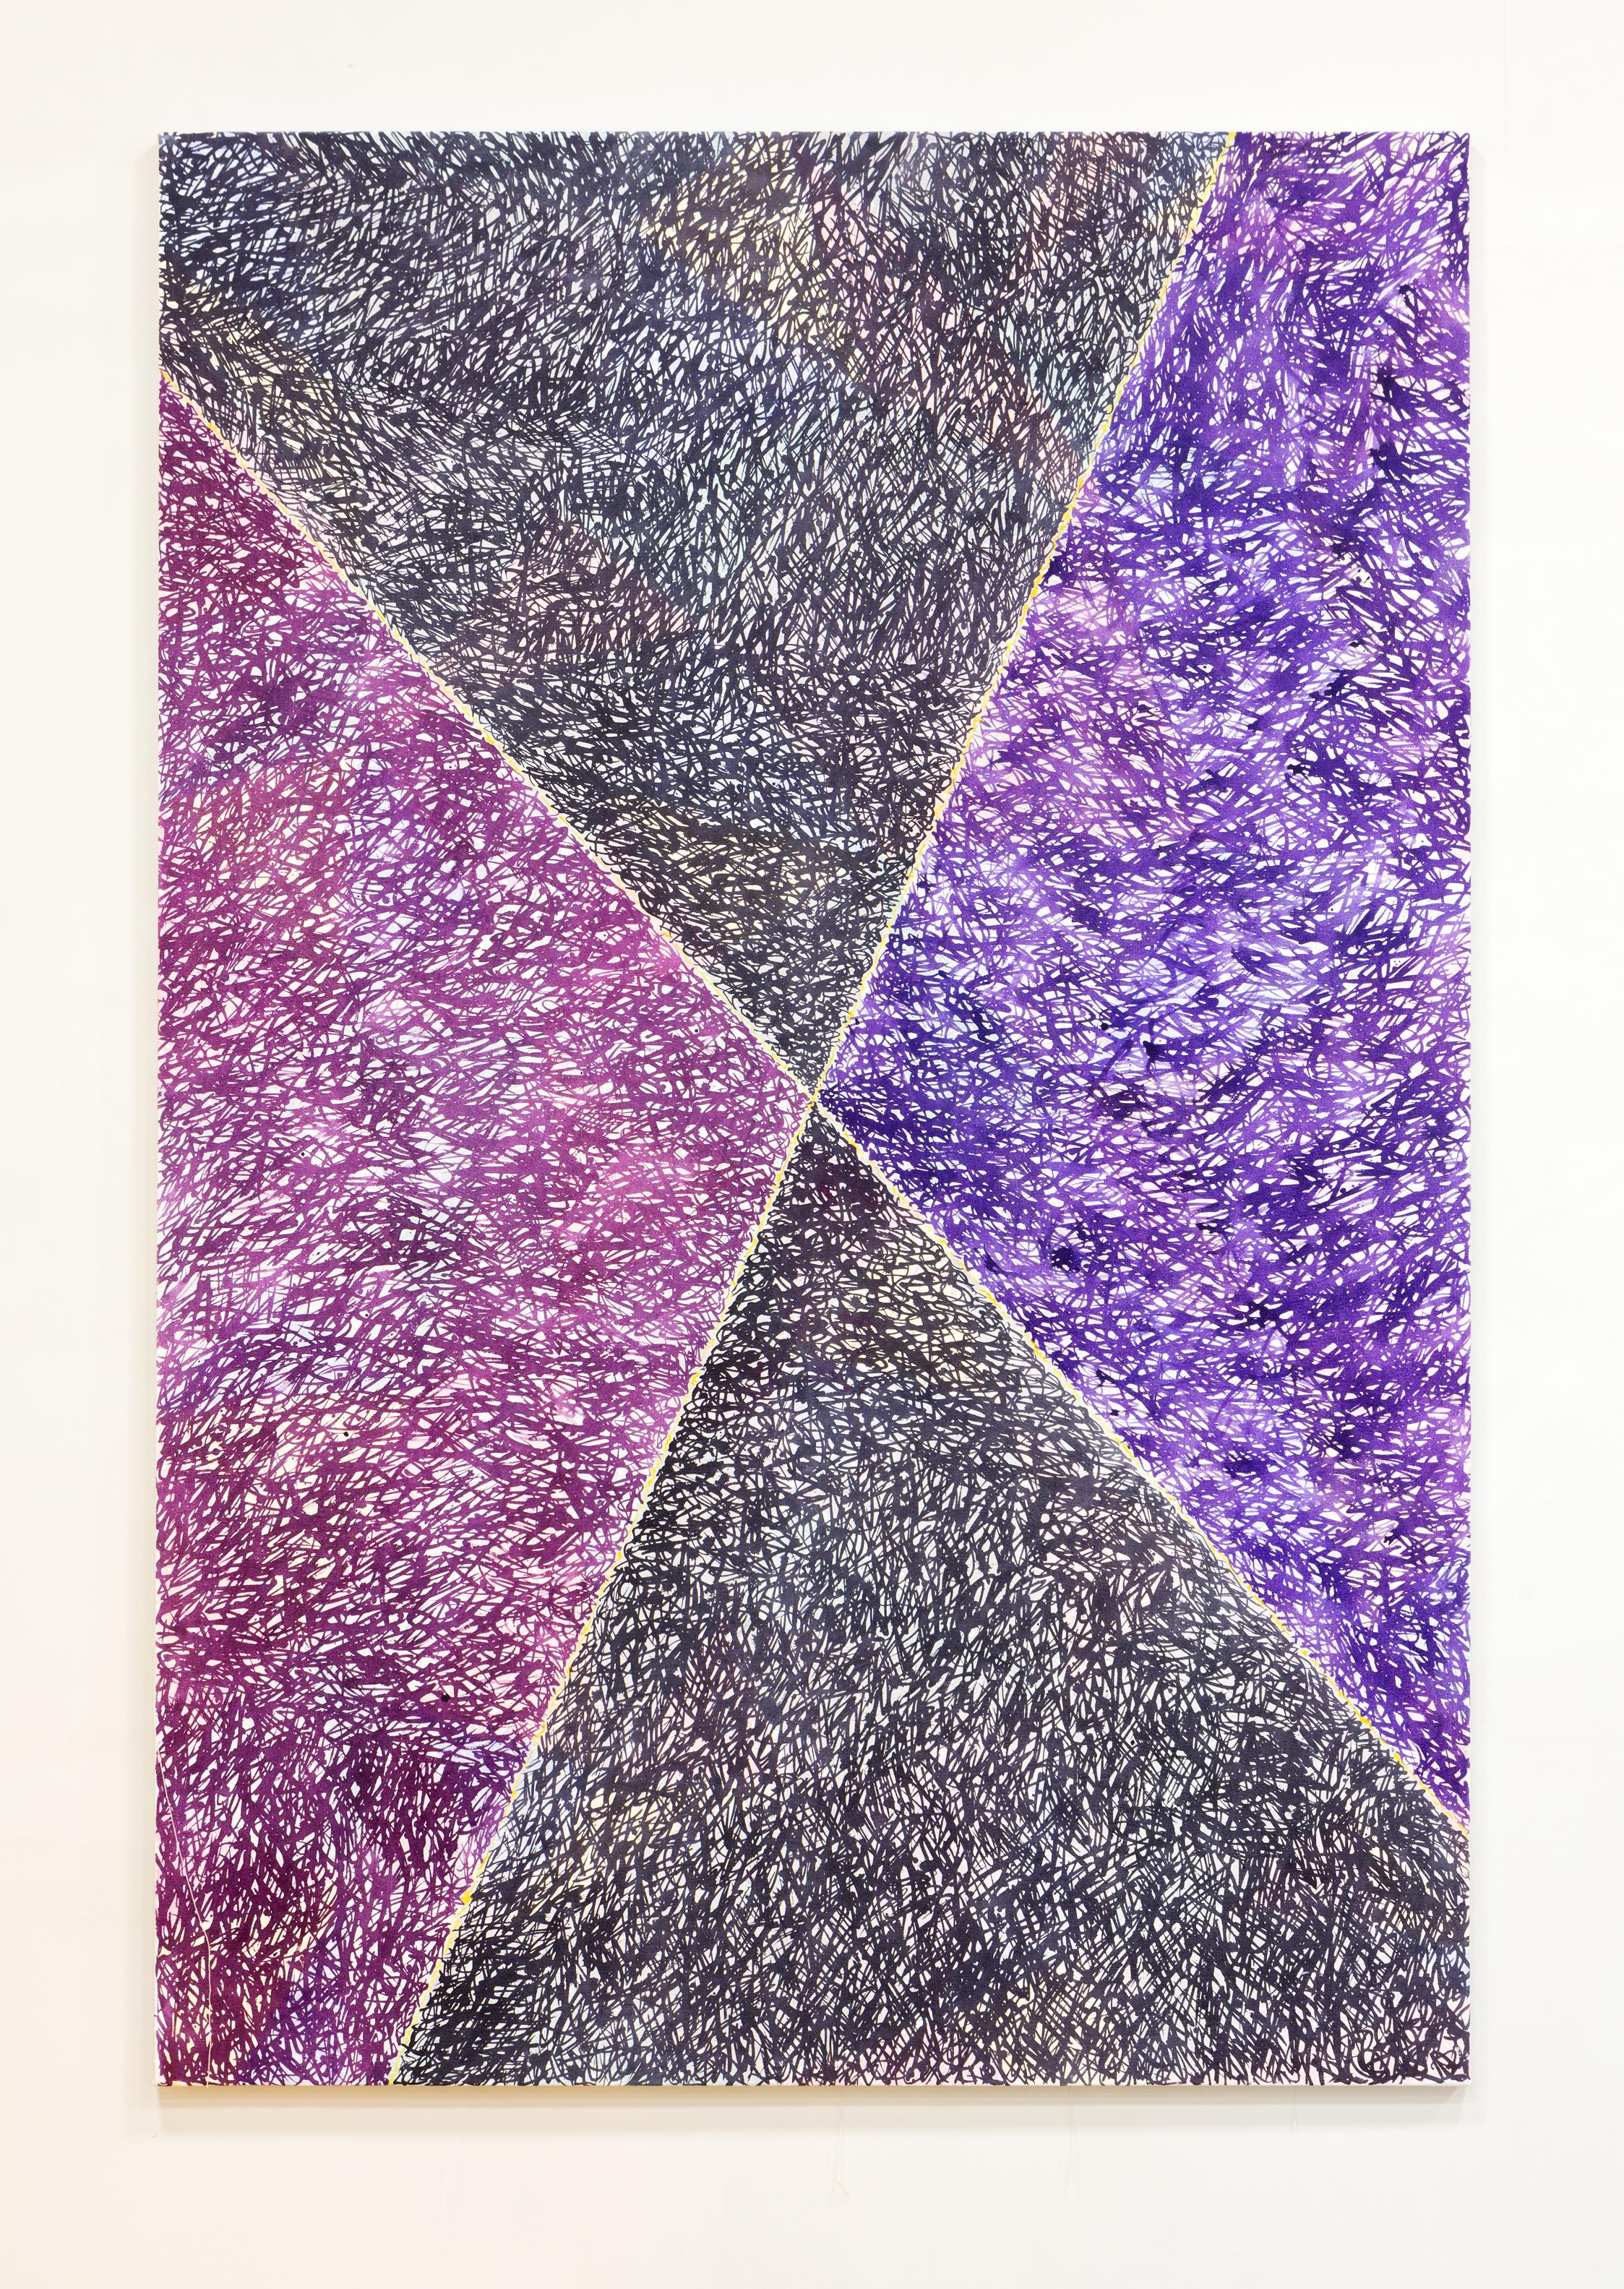 Taboada , 2016 acrylic ink on canvas 76.5 x 53.25 inches